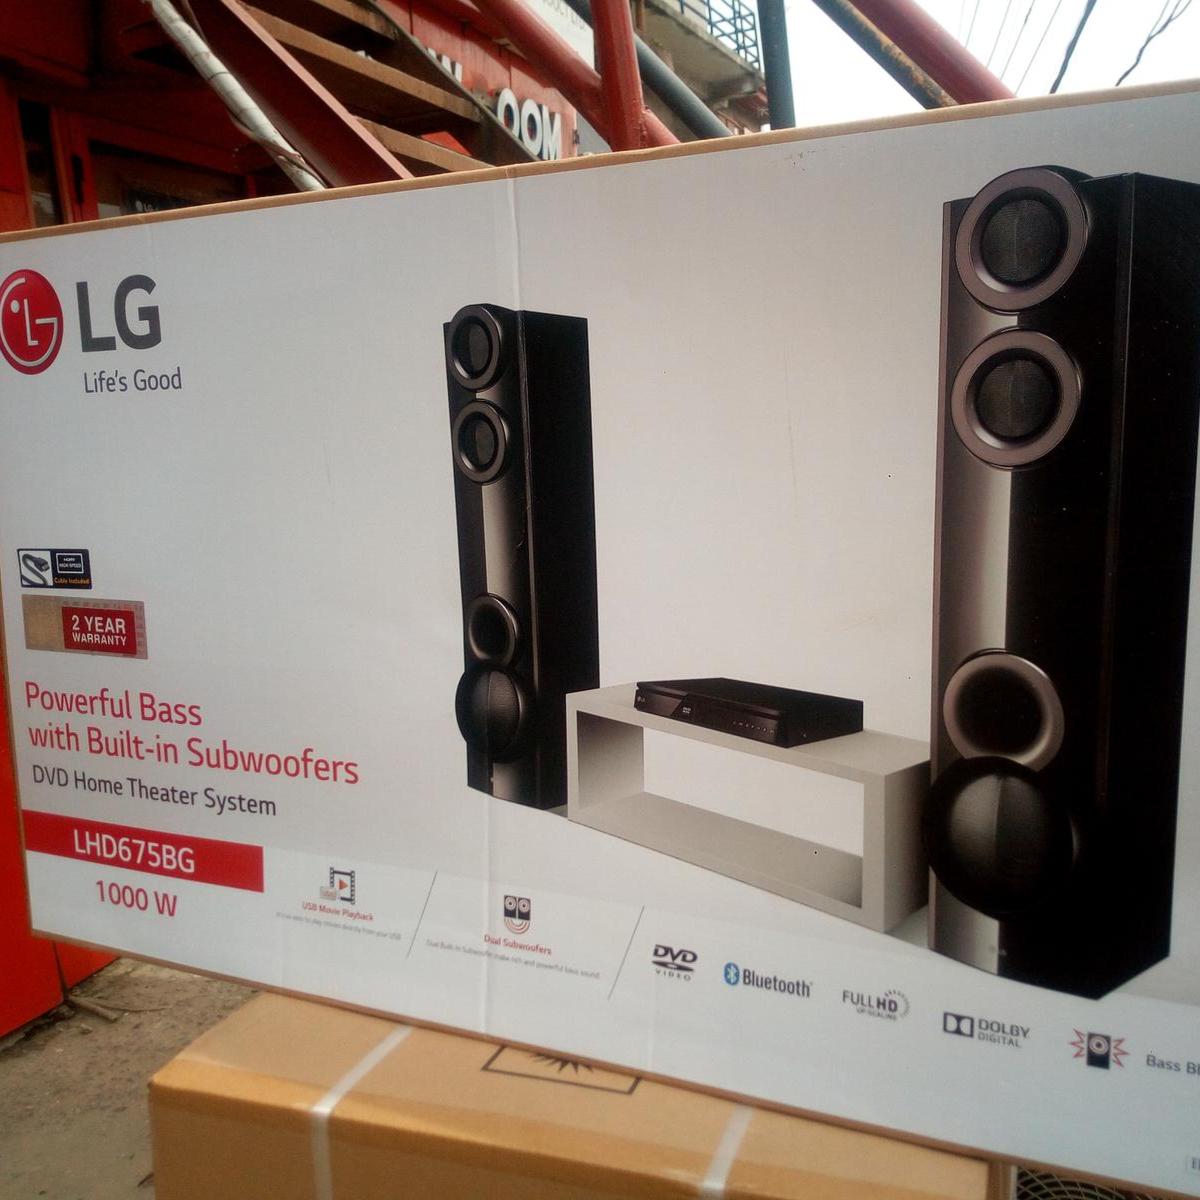 LG Blu-Ray Home Theater 1000W